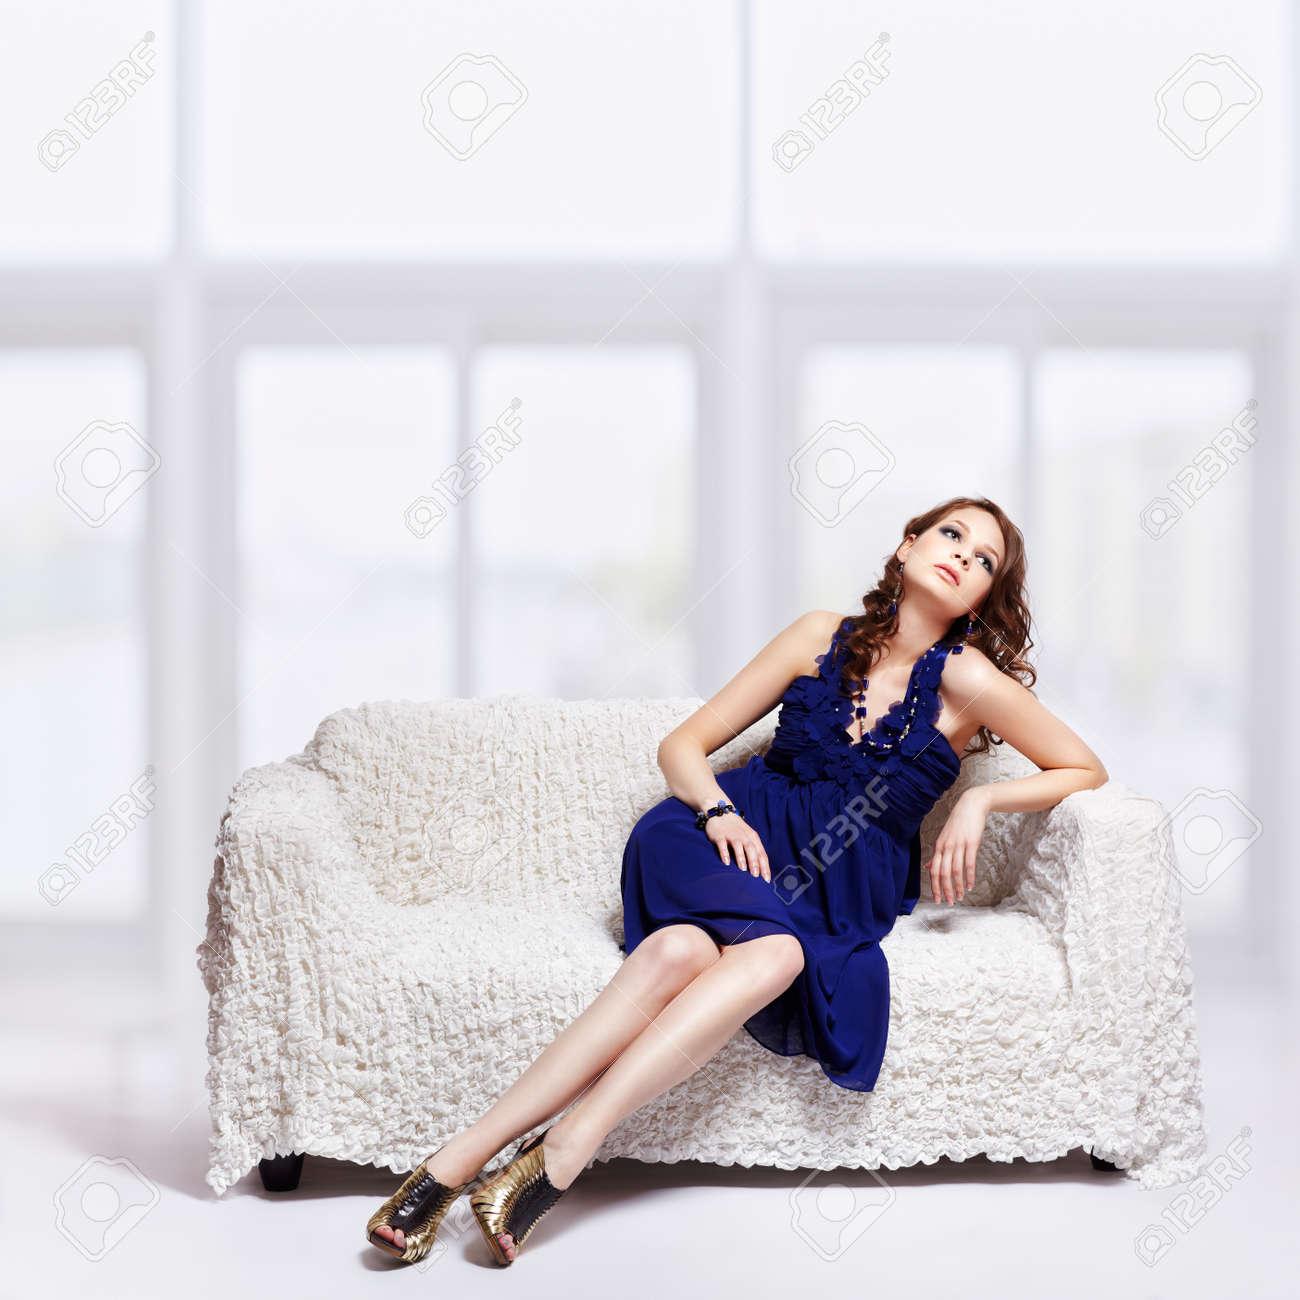 Mujer sentada vestido azul